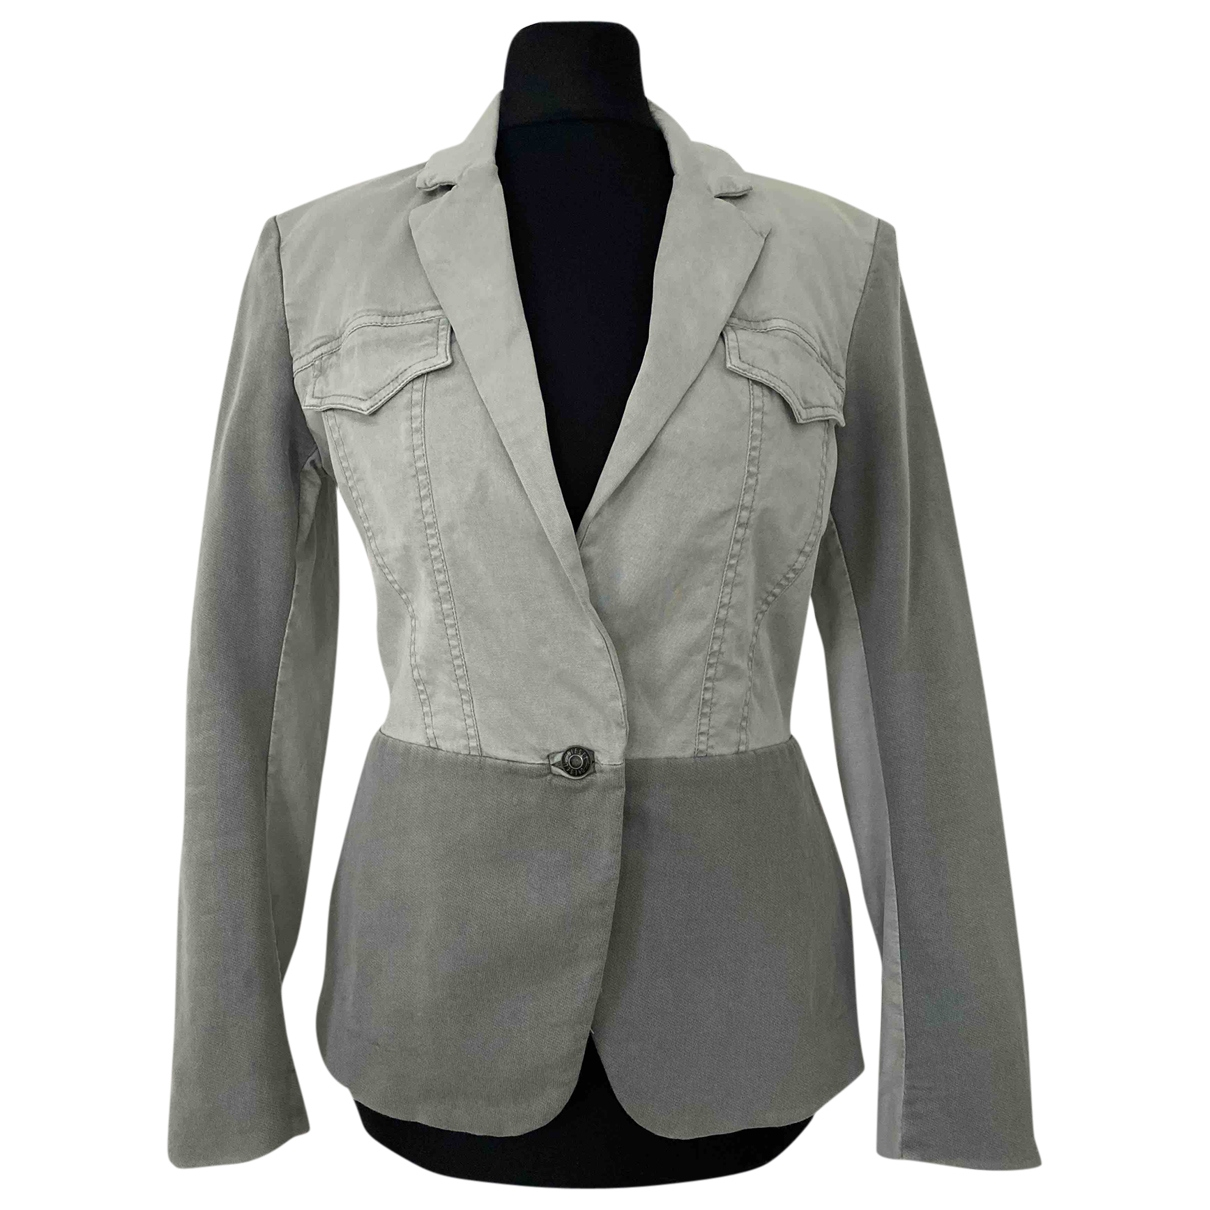 Diesel \N Khaki Cotton jacket for Women XS International